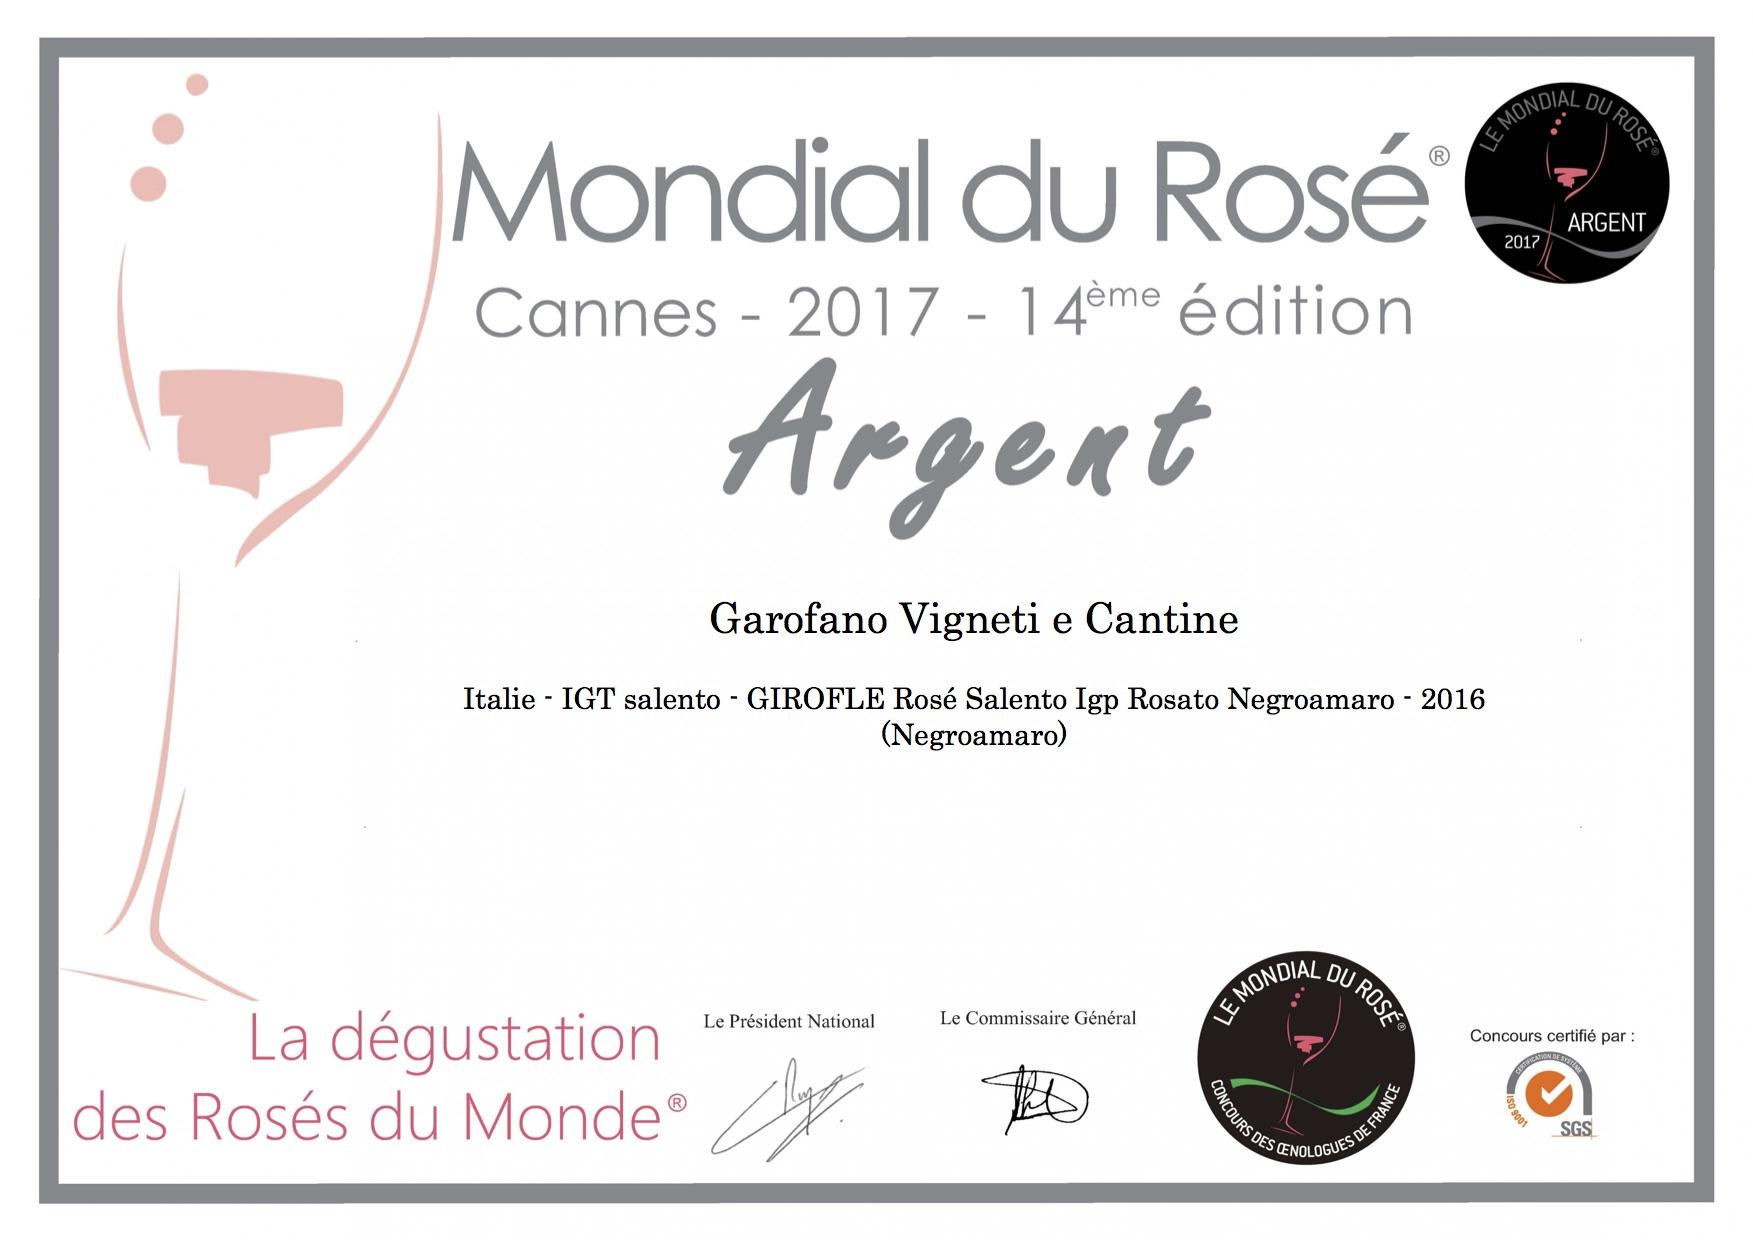 medaglia di argento al Mondial du Rosé